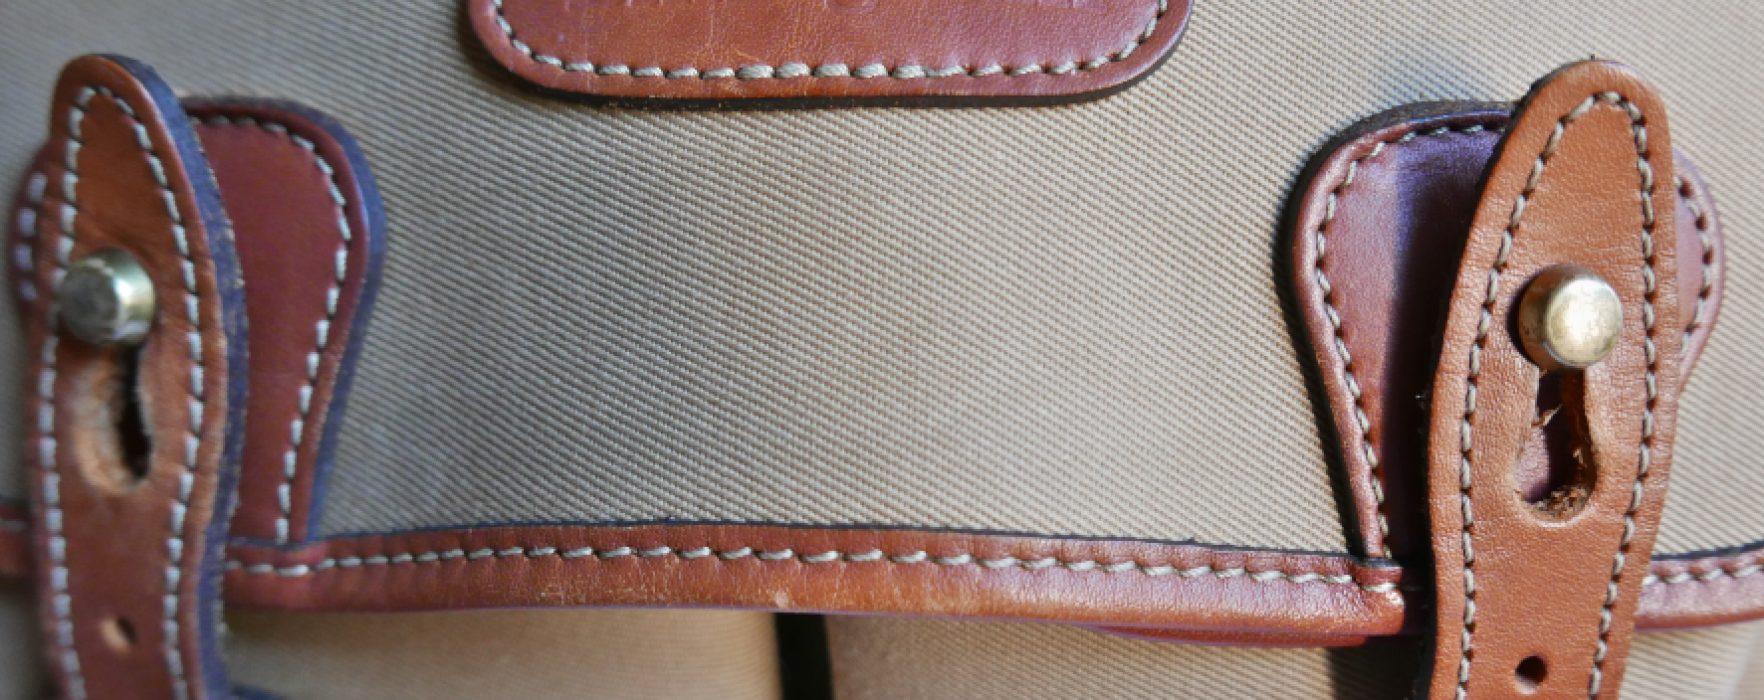 #843. What's in my Bag? (Adam)